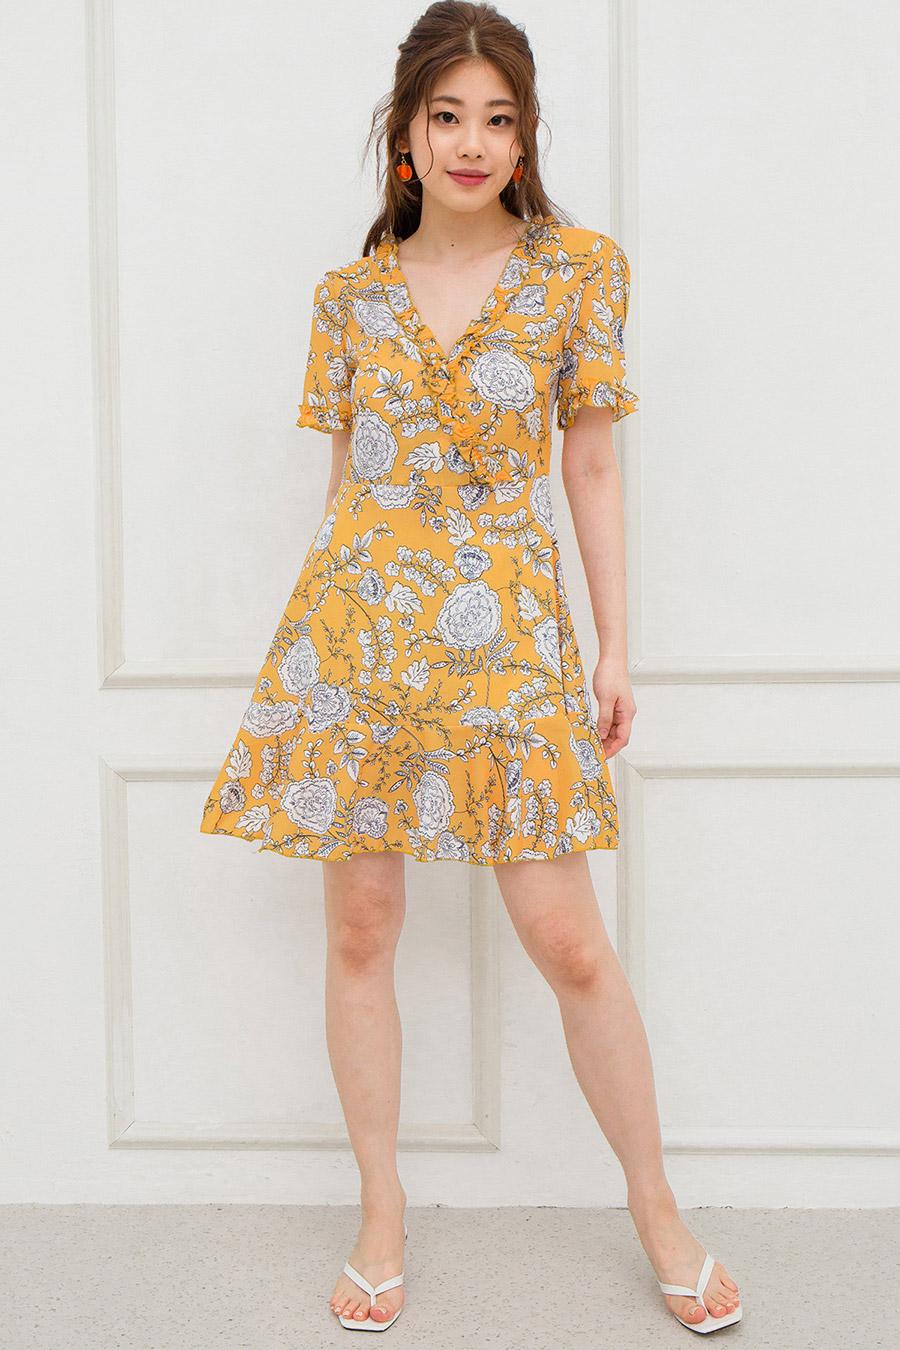 MOREAU DRESS - TANGERINE FLEUR